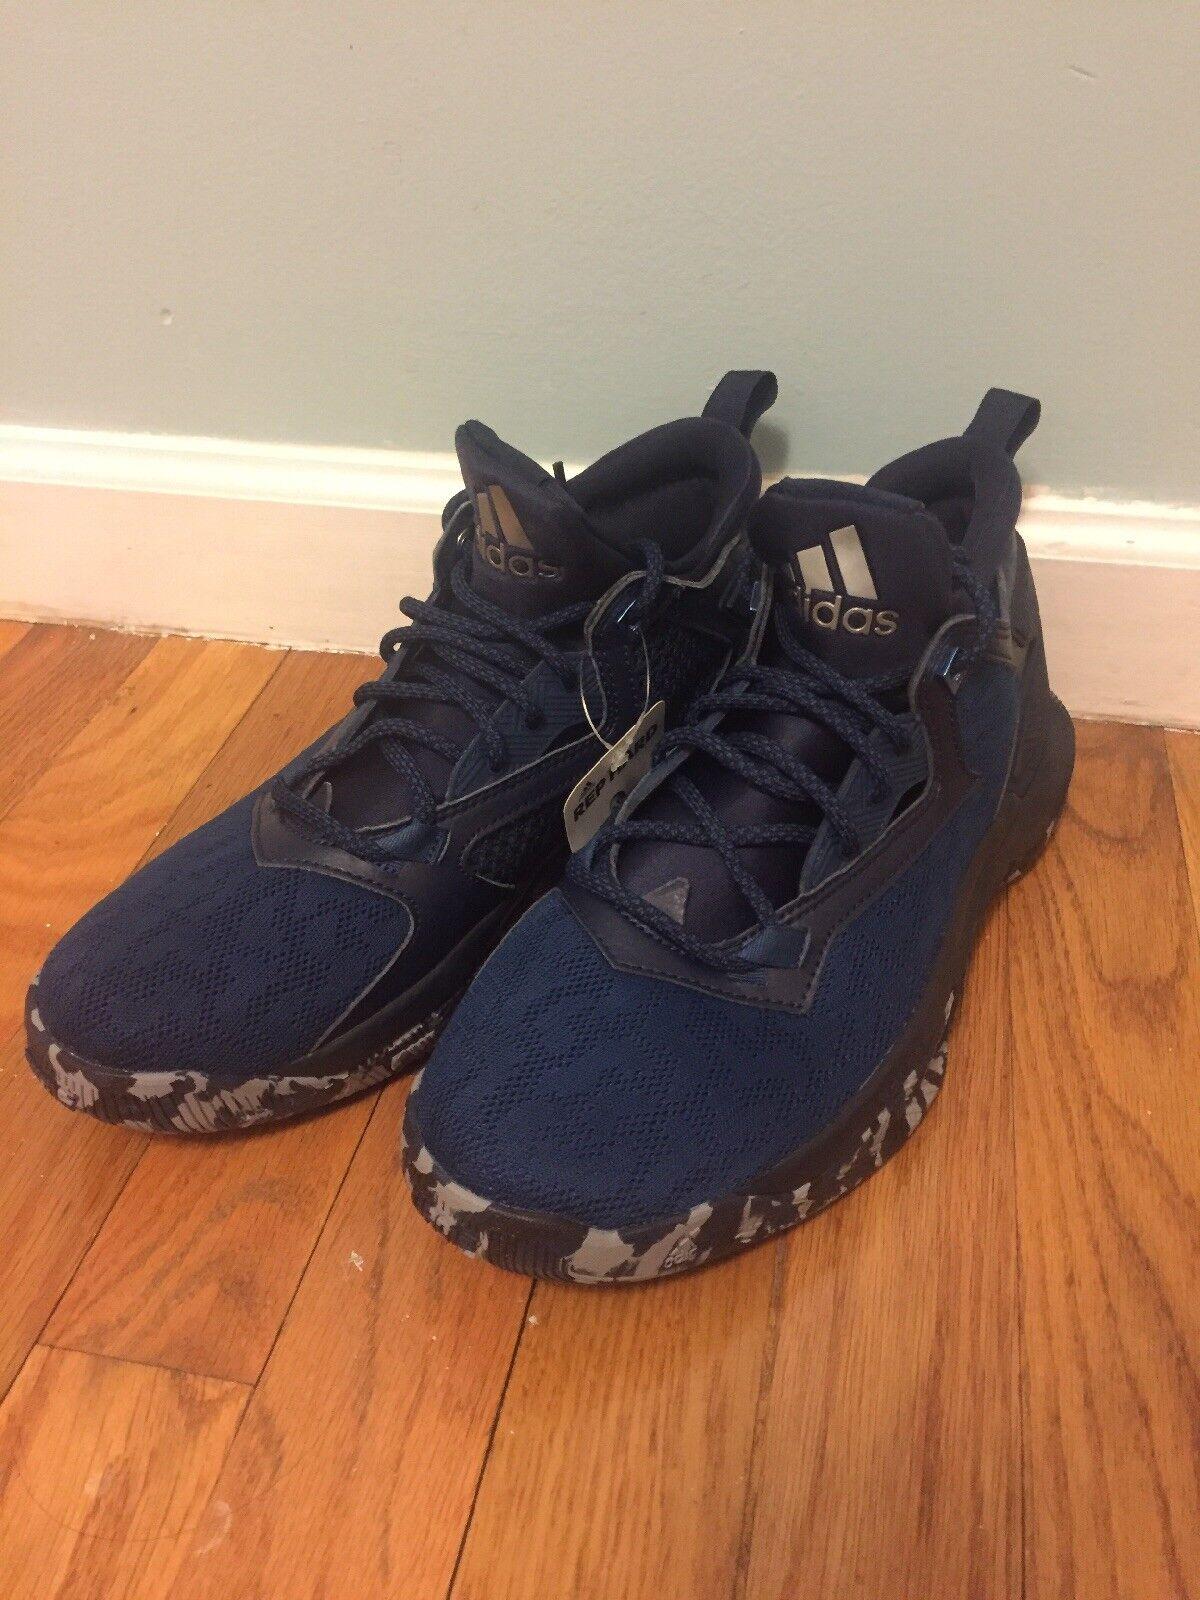 New Adidas D Lillard 2 Size 8 bluee Grey Black (B42380) Basketball shoes